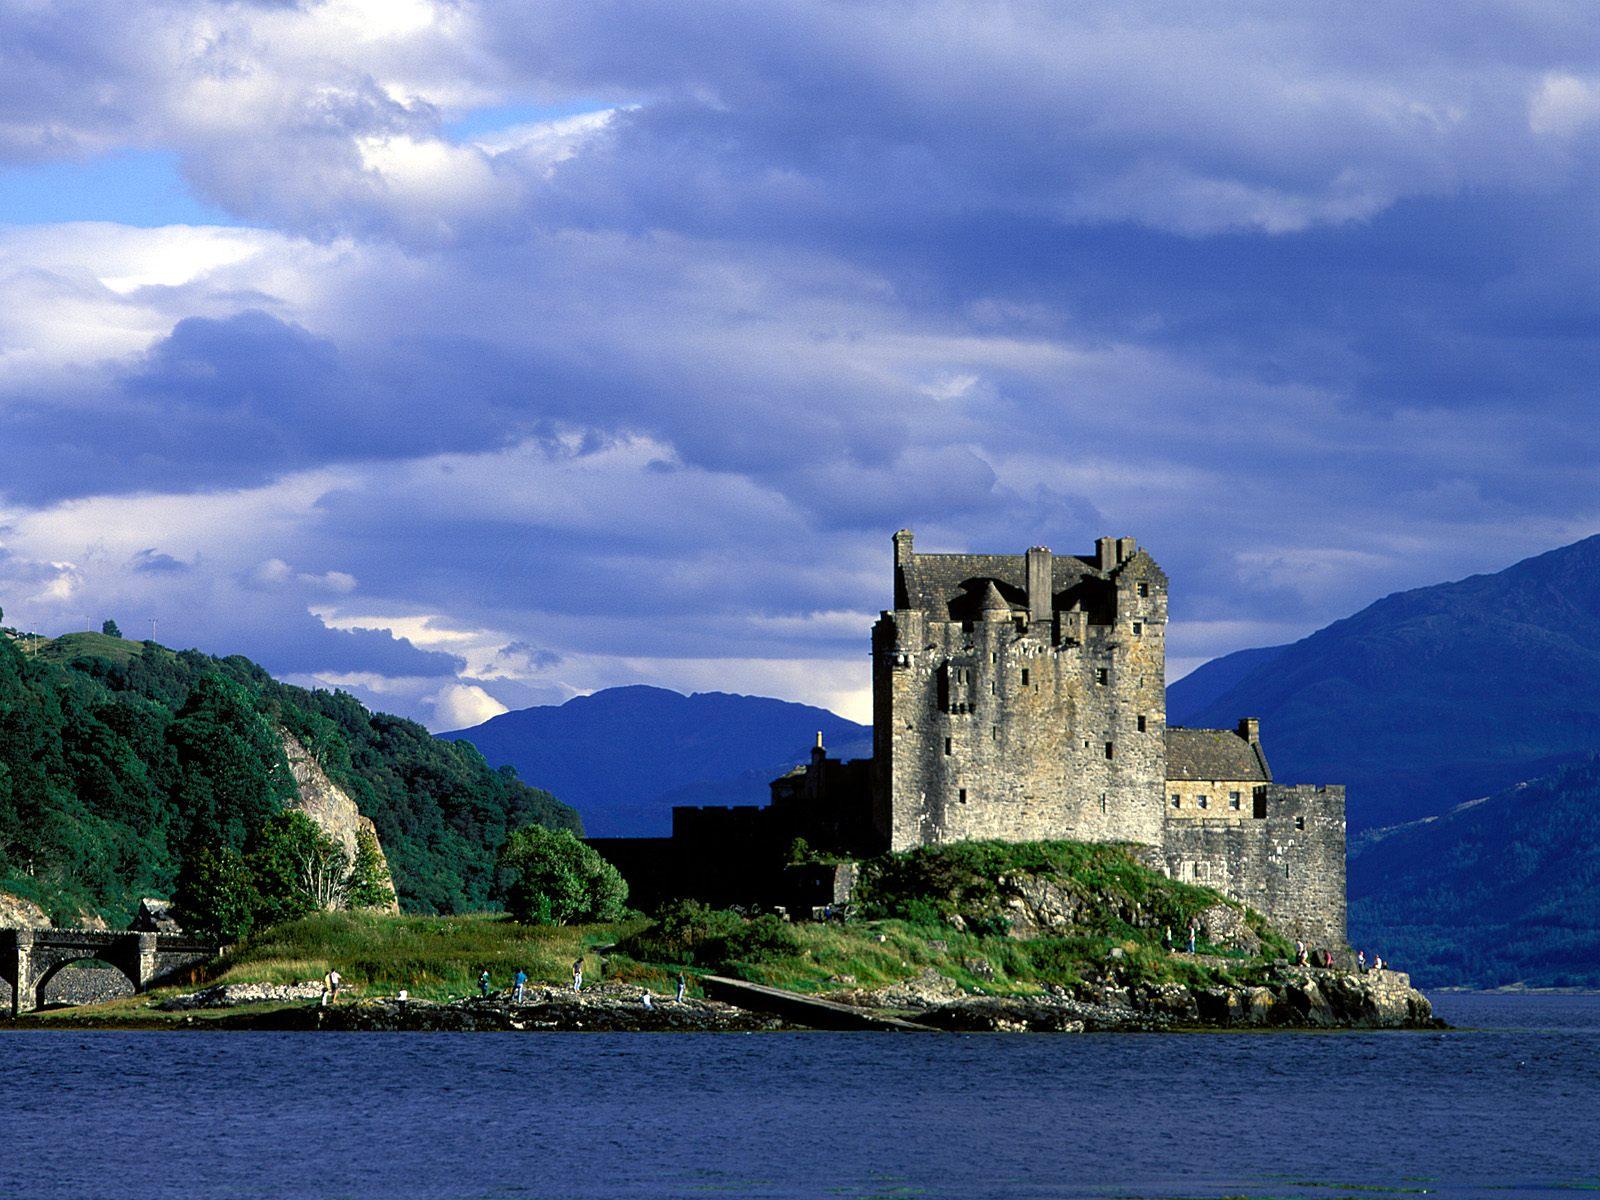 http://4.bp.blogspot.com/-1zL-EL0v6mo/TnG8RM9ib-I/AAAAAAAAAVA/8vWuDk06y_4/s1600/Eilean+Donan+Castle%252C+Loch+Duich%252C+Scotland.jpg